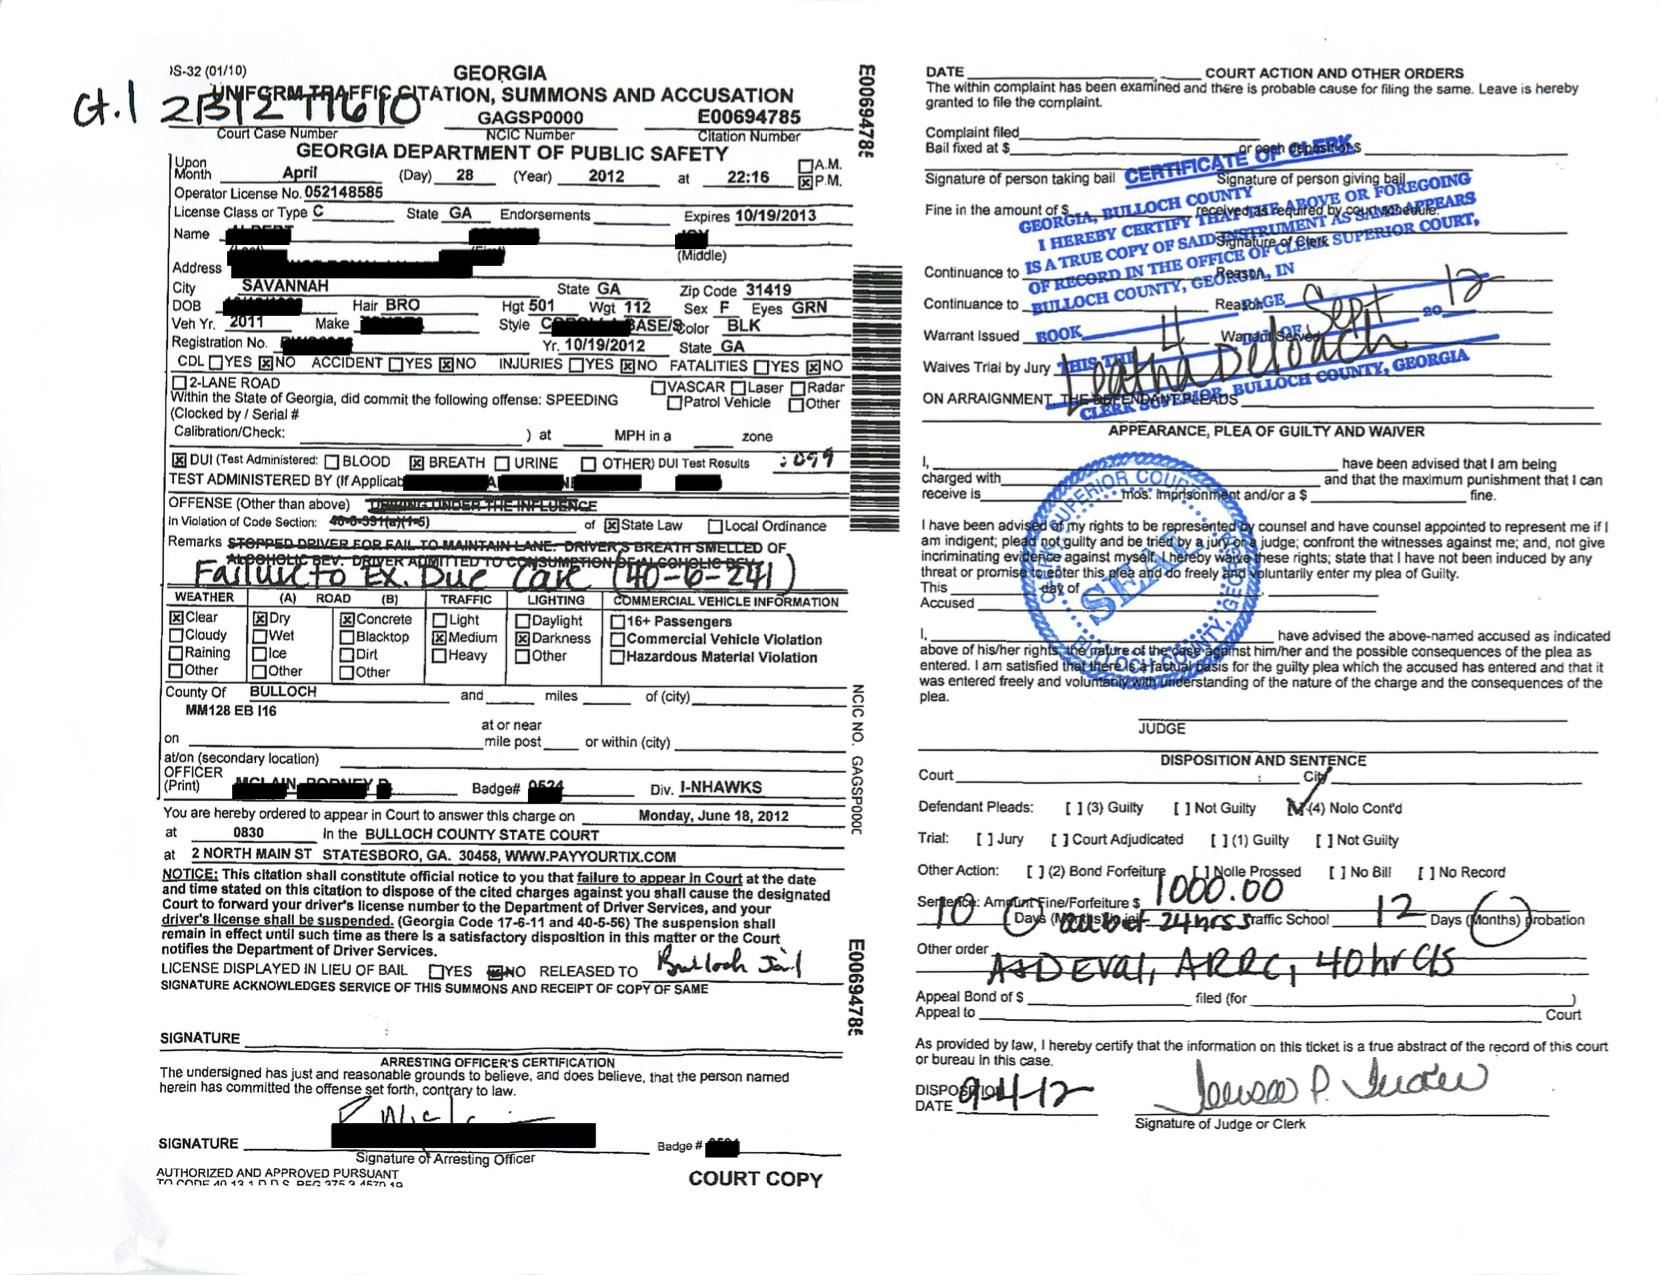 DUI .108 dropped in Statesboro Georgia for Veterinarian student in the Bulloch County Superior Court